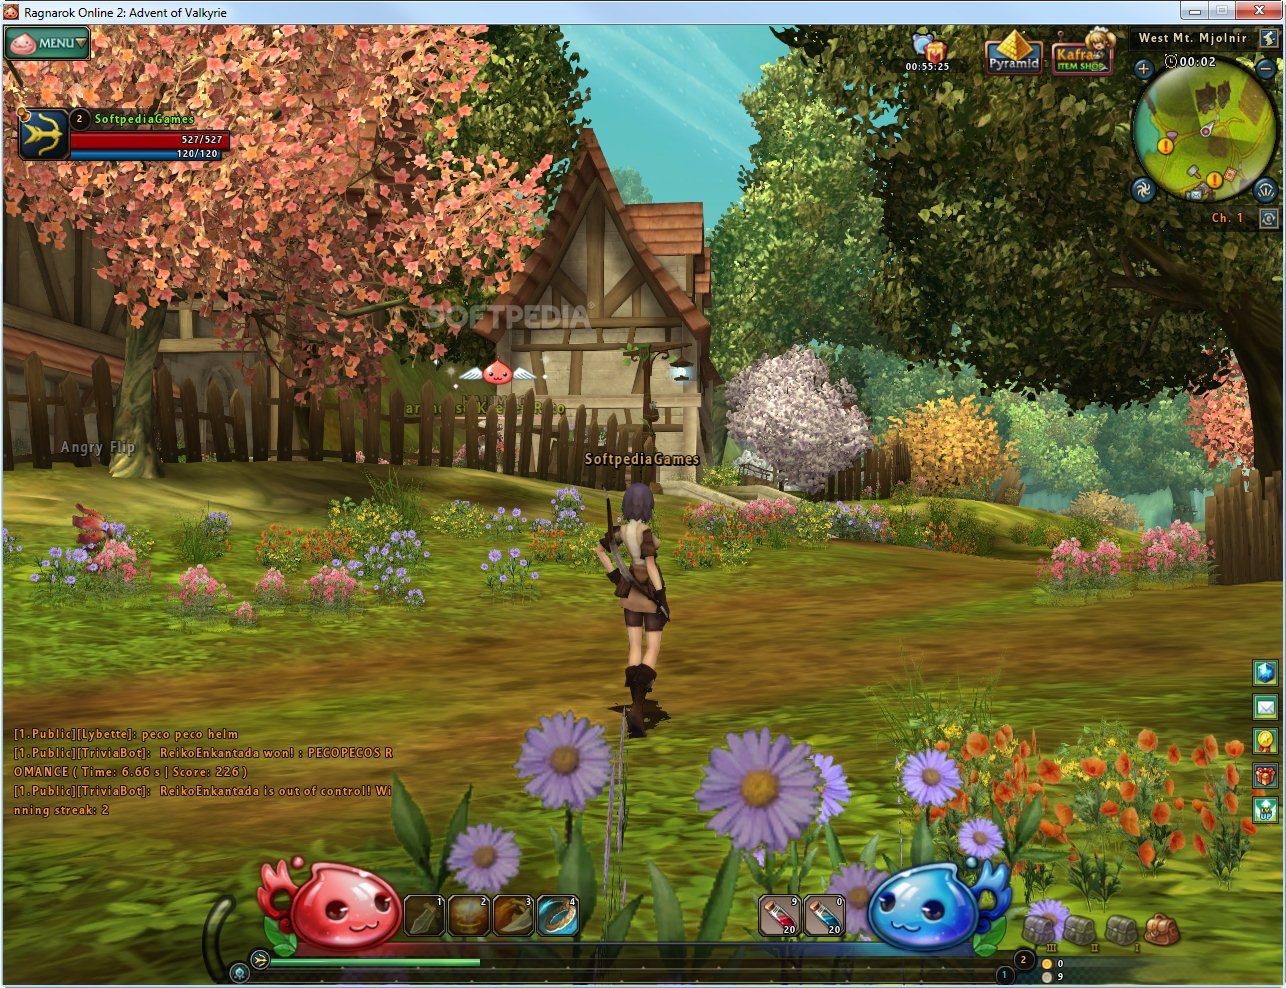 Ragnarok Online 2: Advent of Valkyrie Download